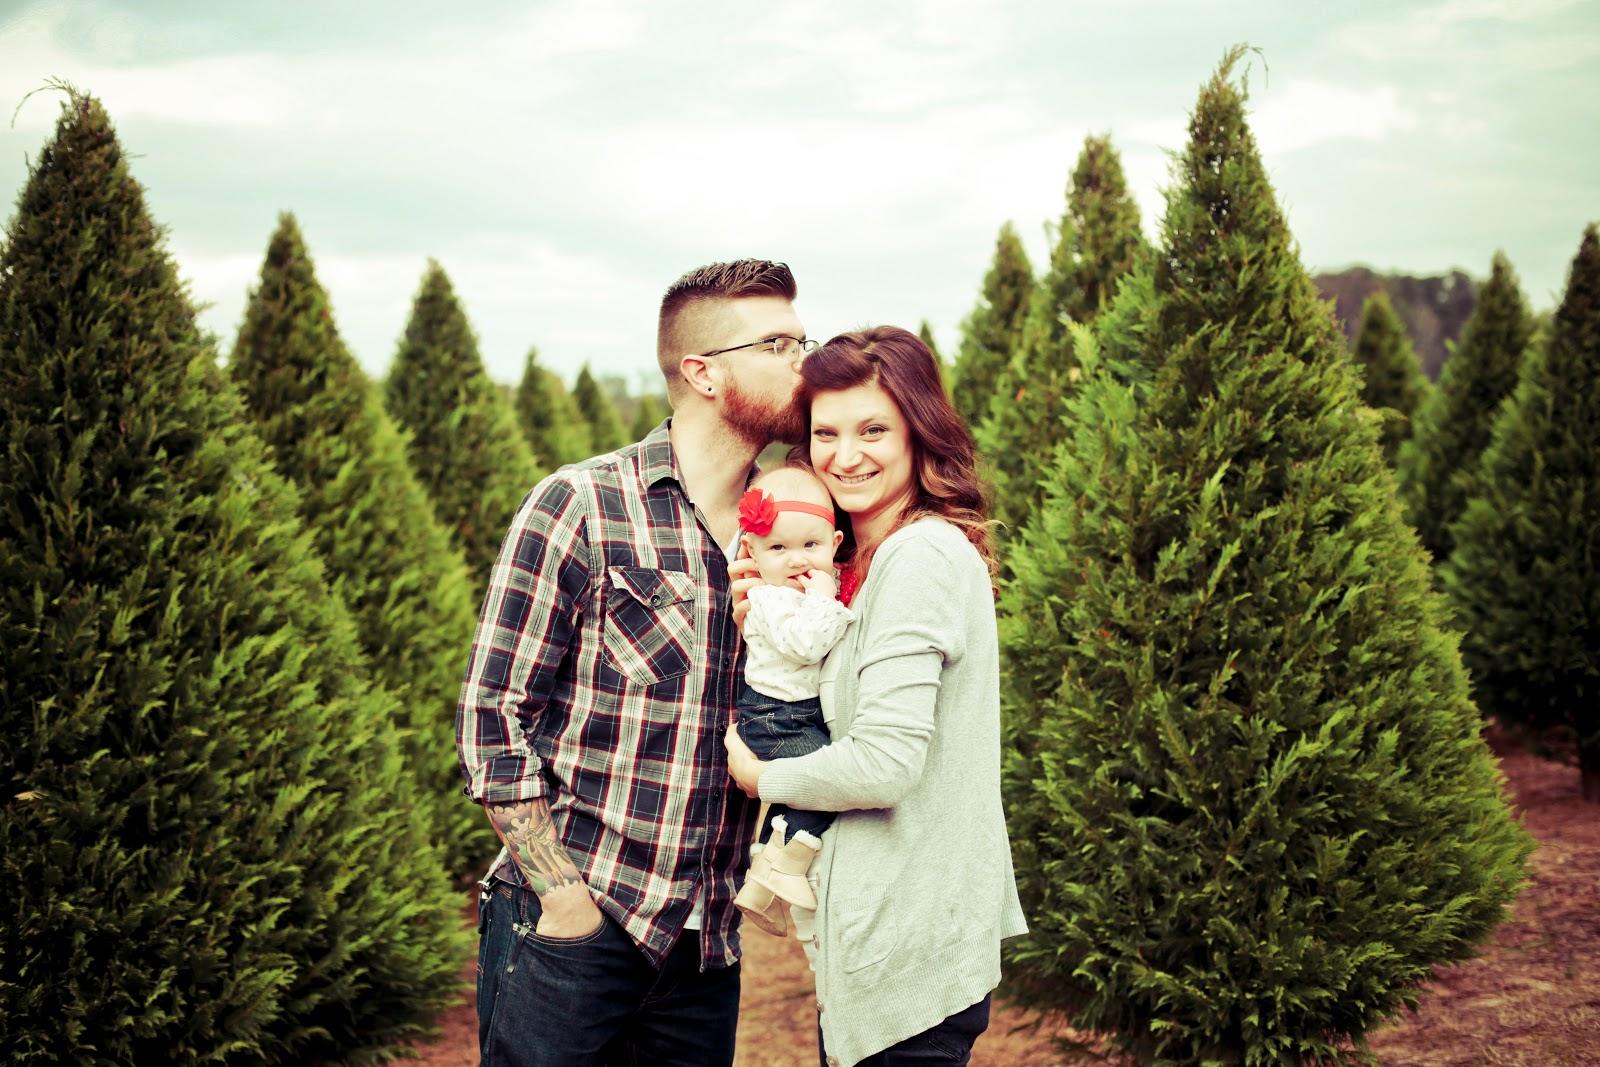 Christmas Tree Farm Family Photos.Kelly Is Nice Photography Www Kellyisnice Com Christmas